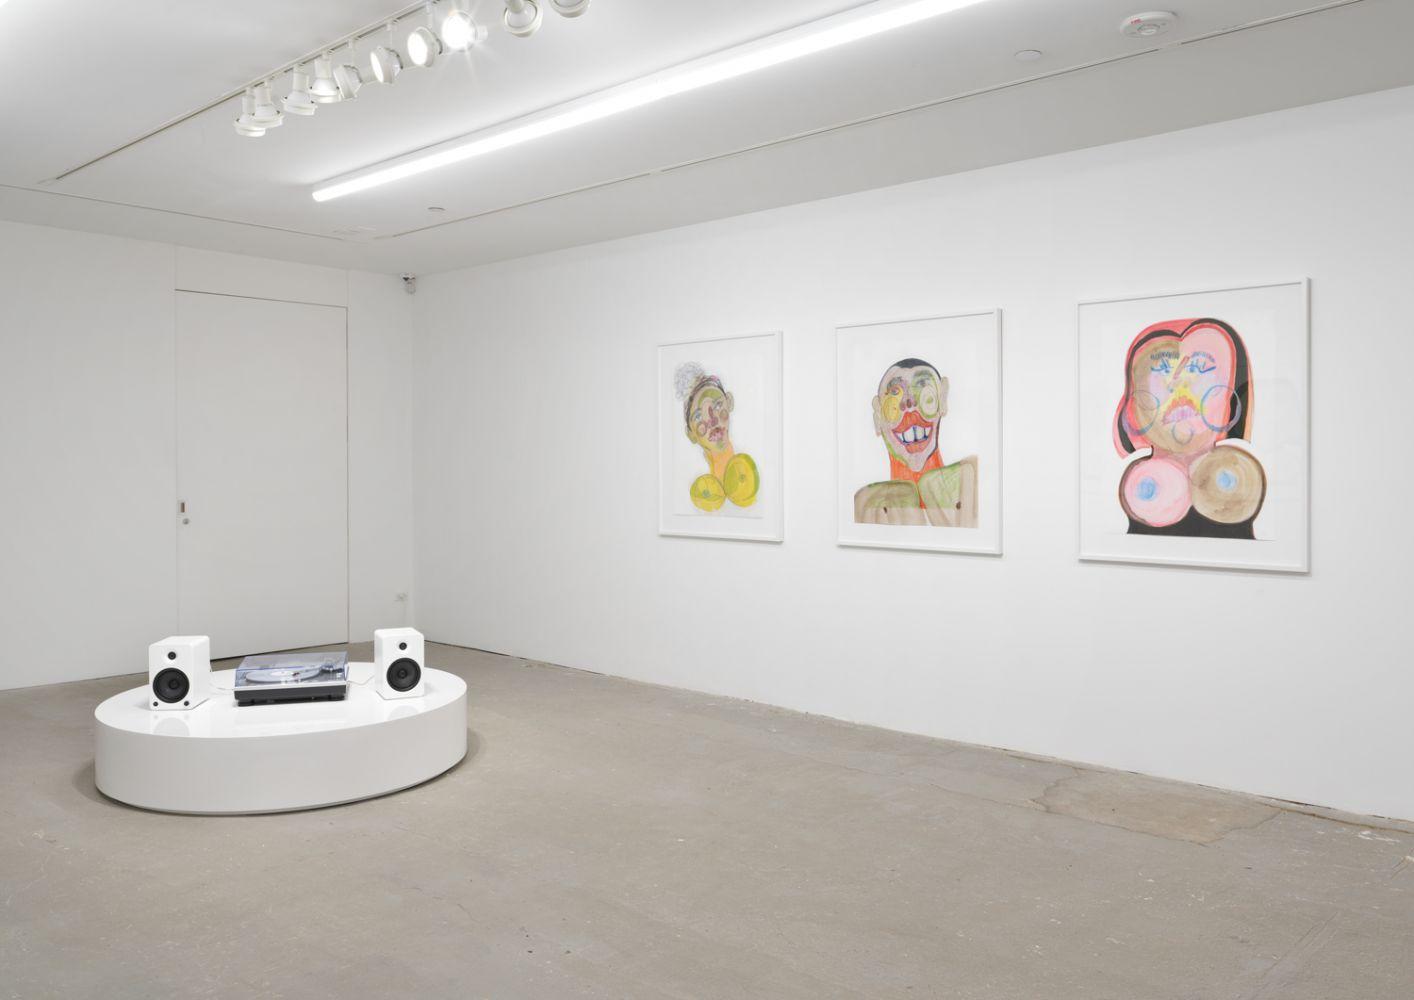 Exhibition View, Tschabalala Self, Cotton Mouth, Eva Presenhuber, New York, 2020 install 15